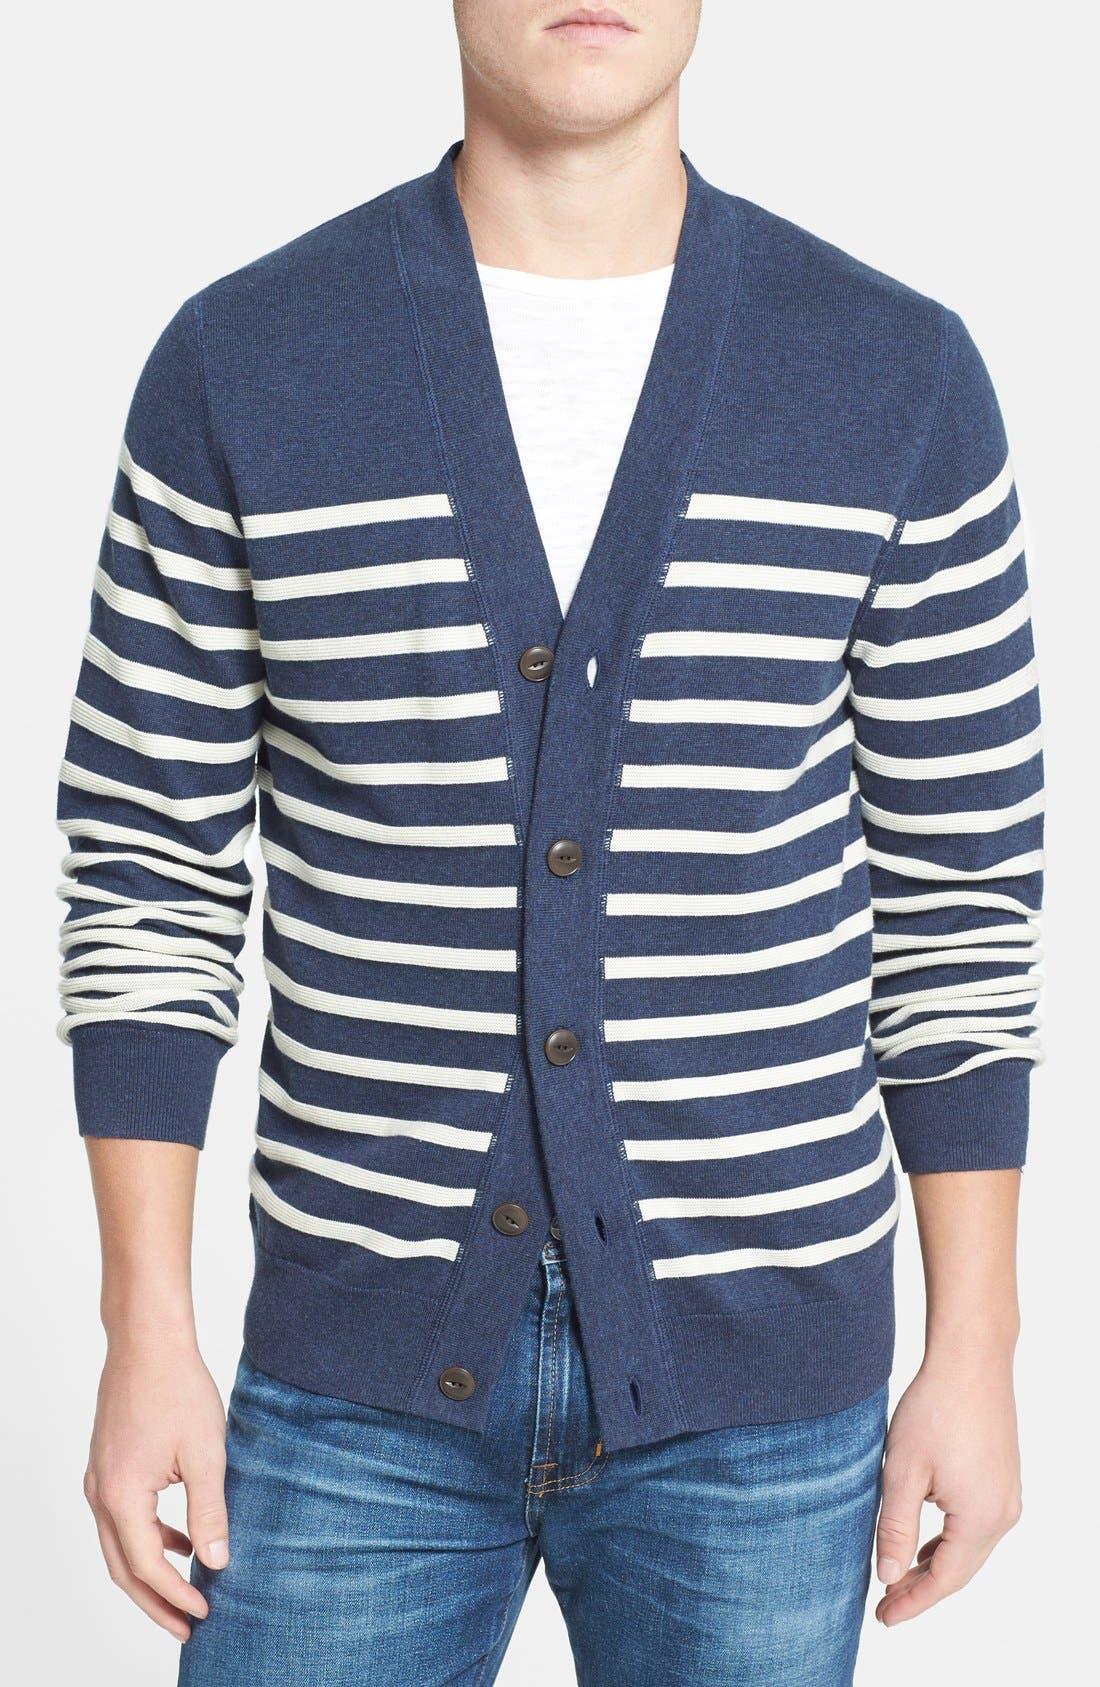 WALLIN & BROS. Ottoman Stripe Cardigan, Main, color, 410